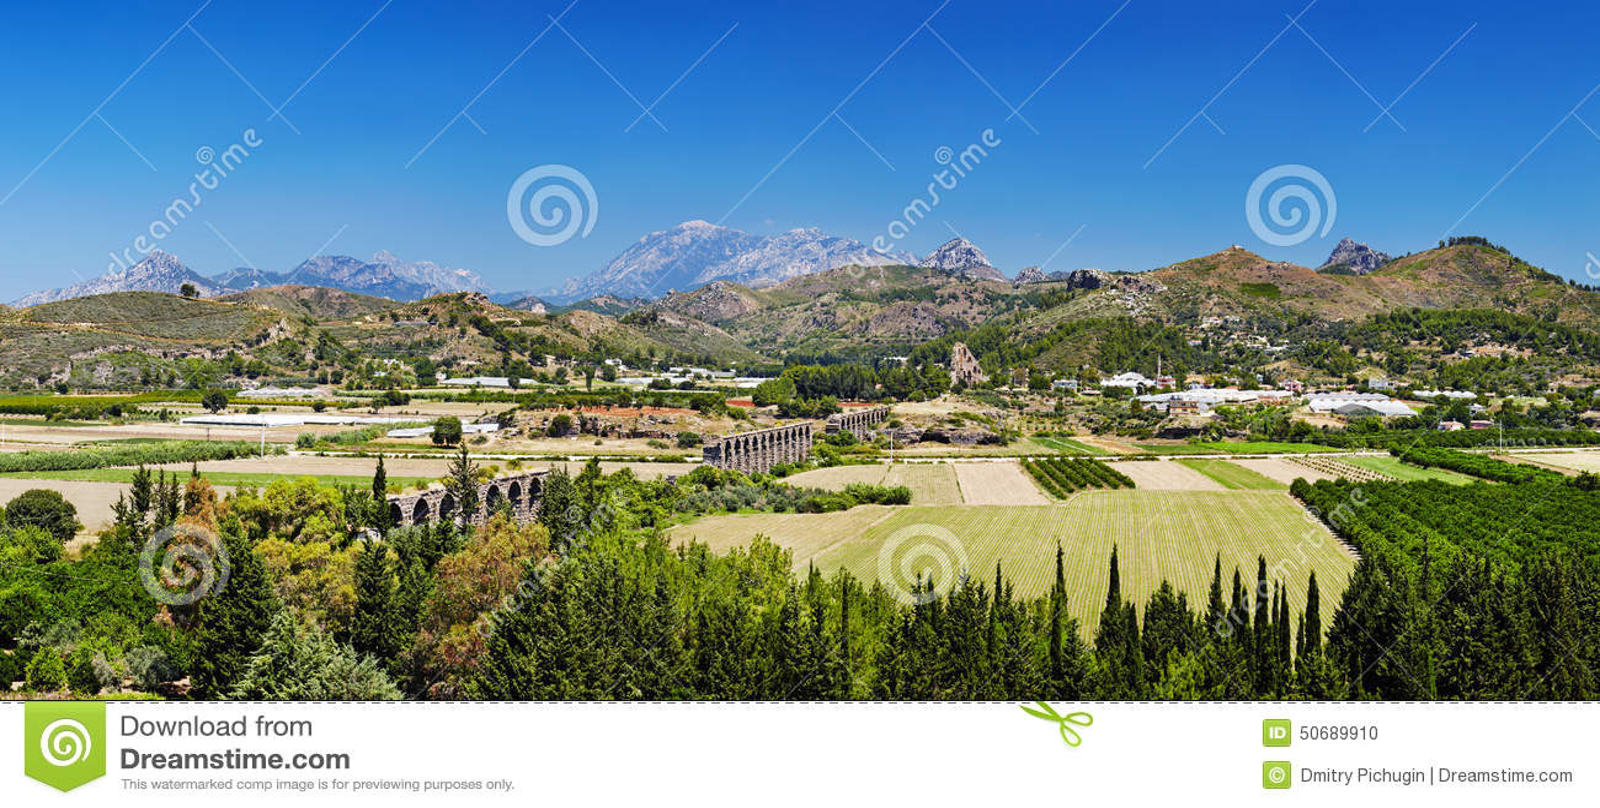 Download 古老罗马渡槽废墟在Aspendos,土耳其 库存照片. 图片 包括有 横向, 蓝色, 环境, 农场, 地中海 - 50689910